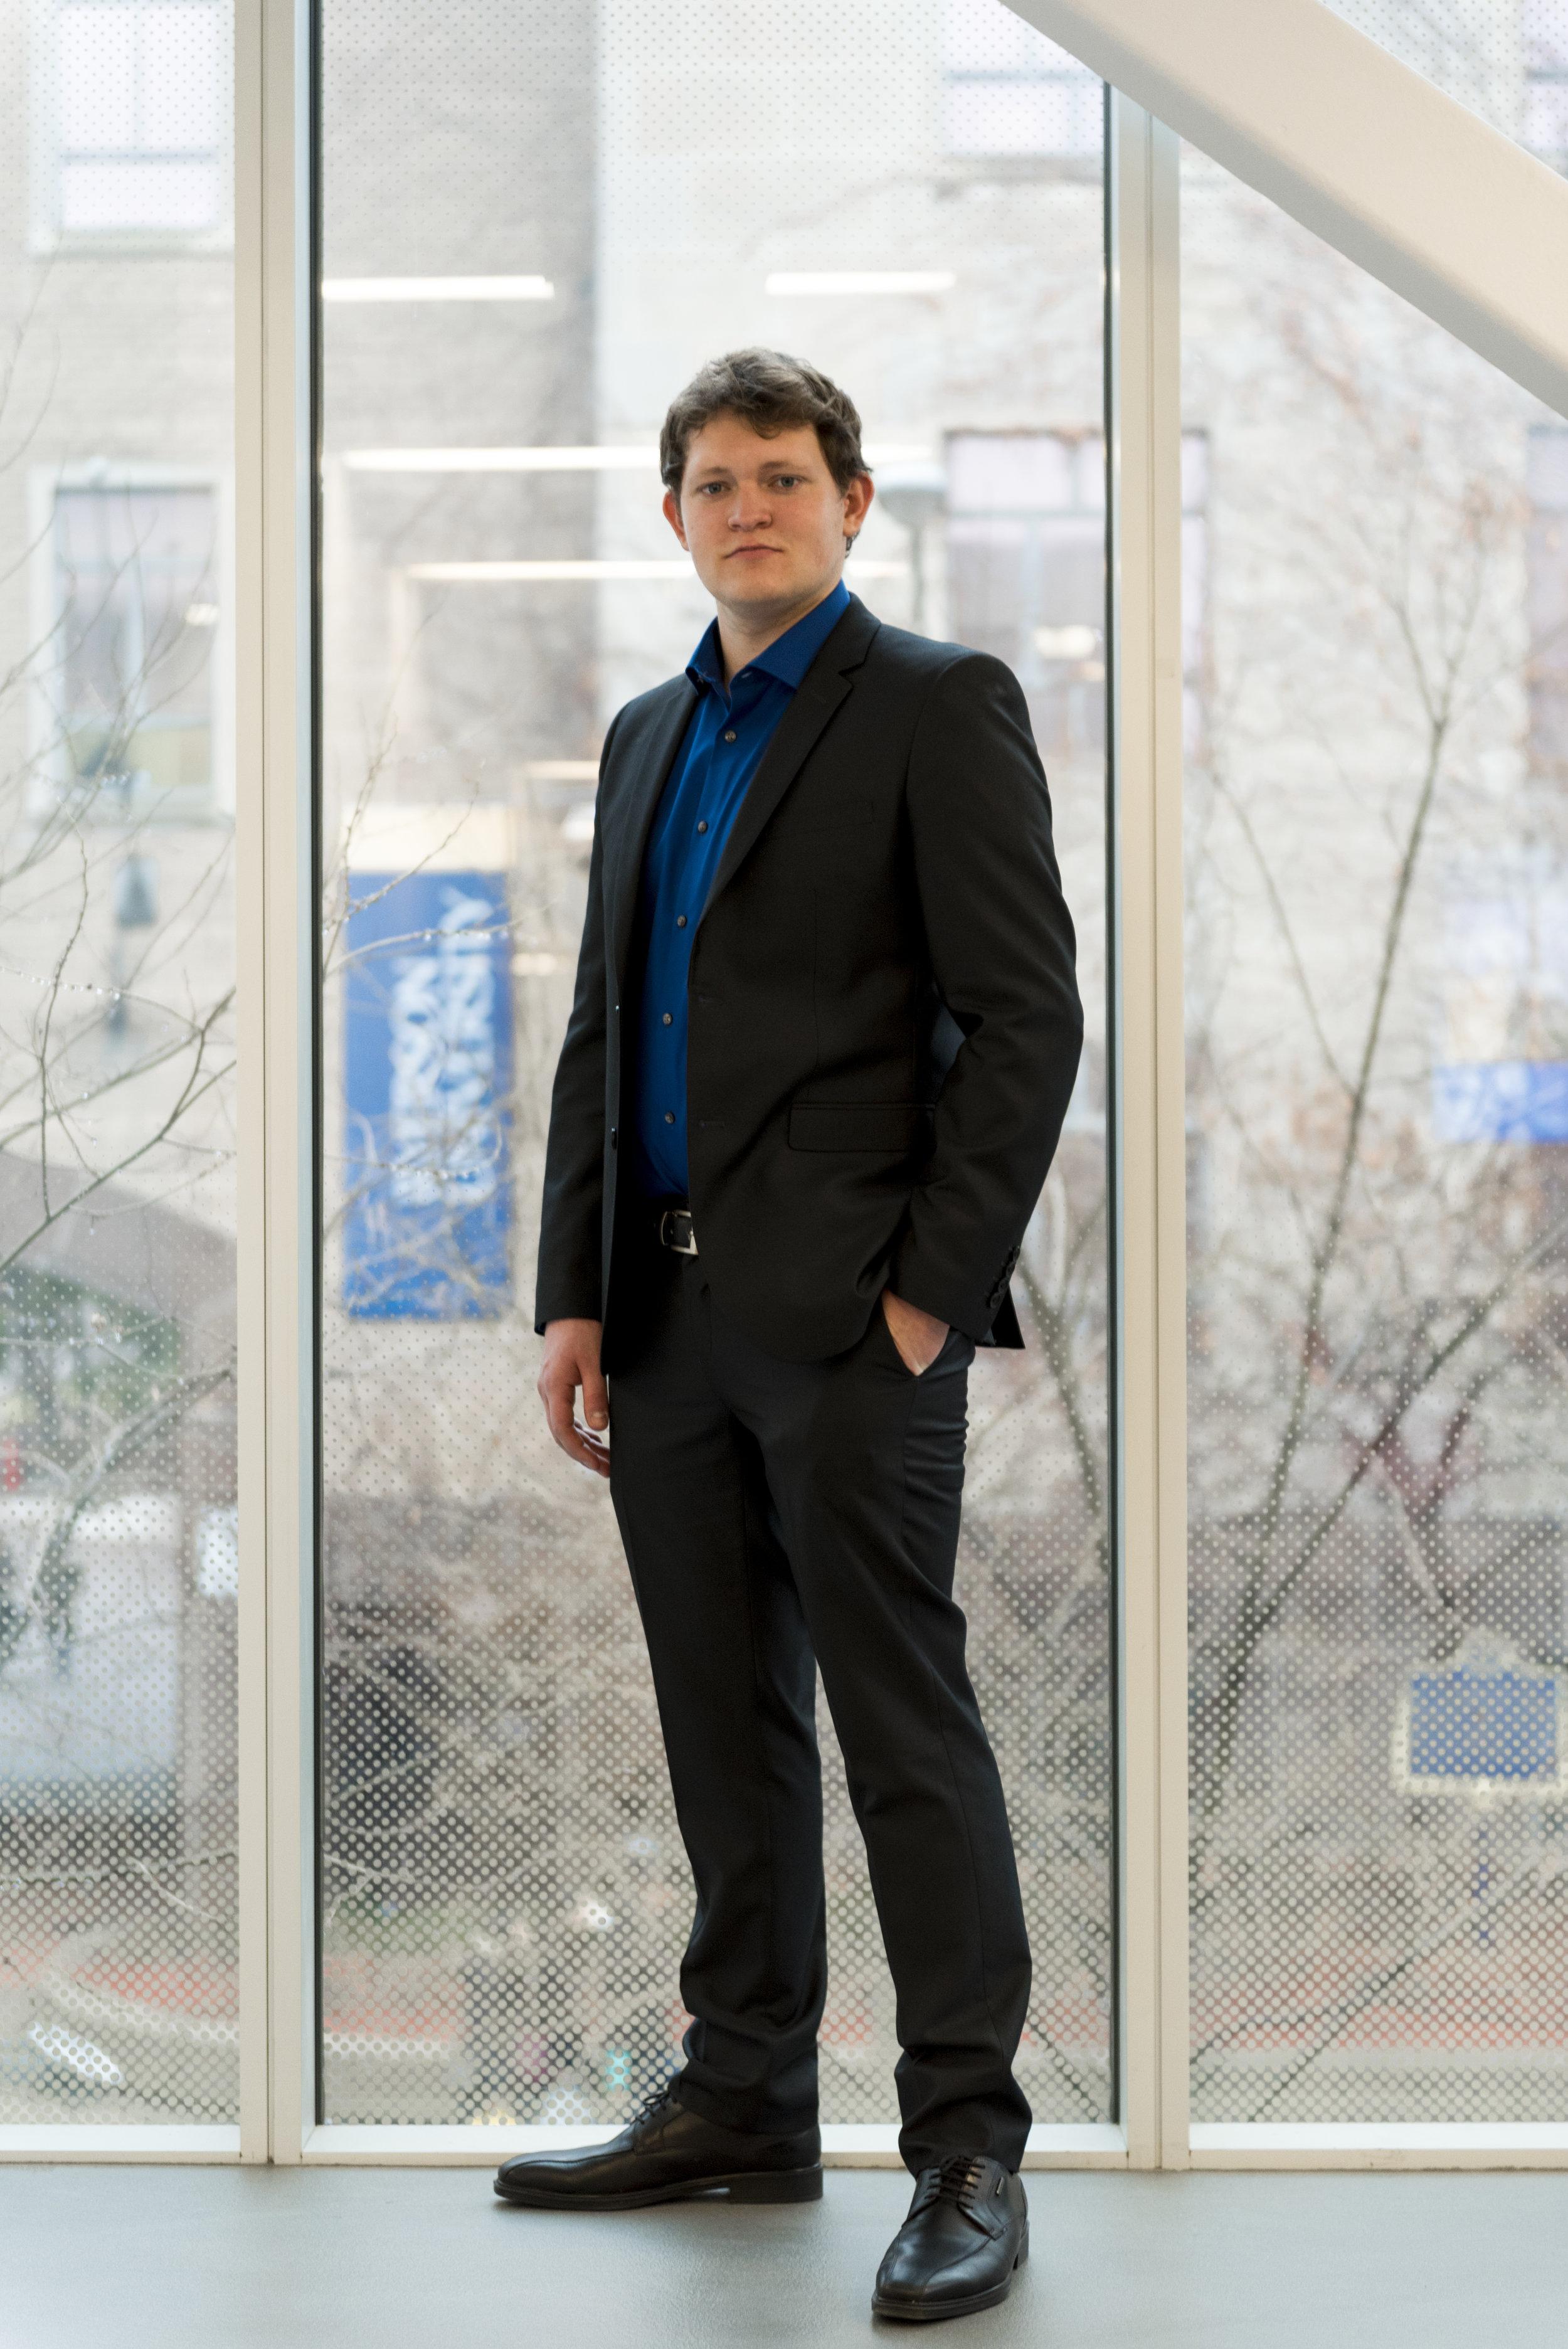 Dmytro Basmat, Executive Director and Founder